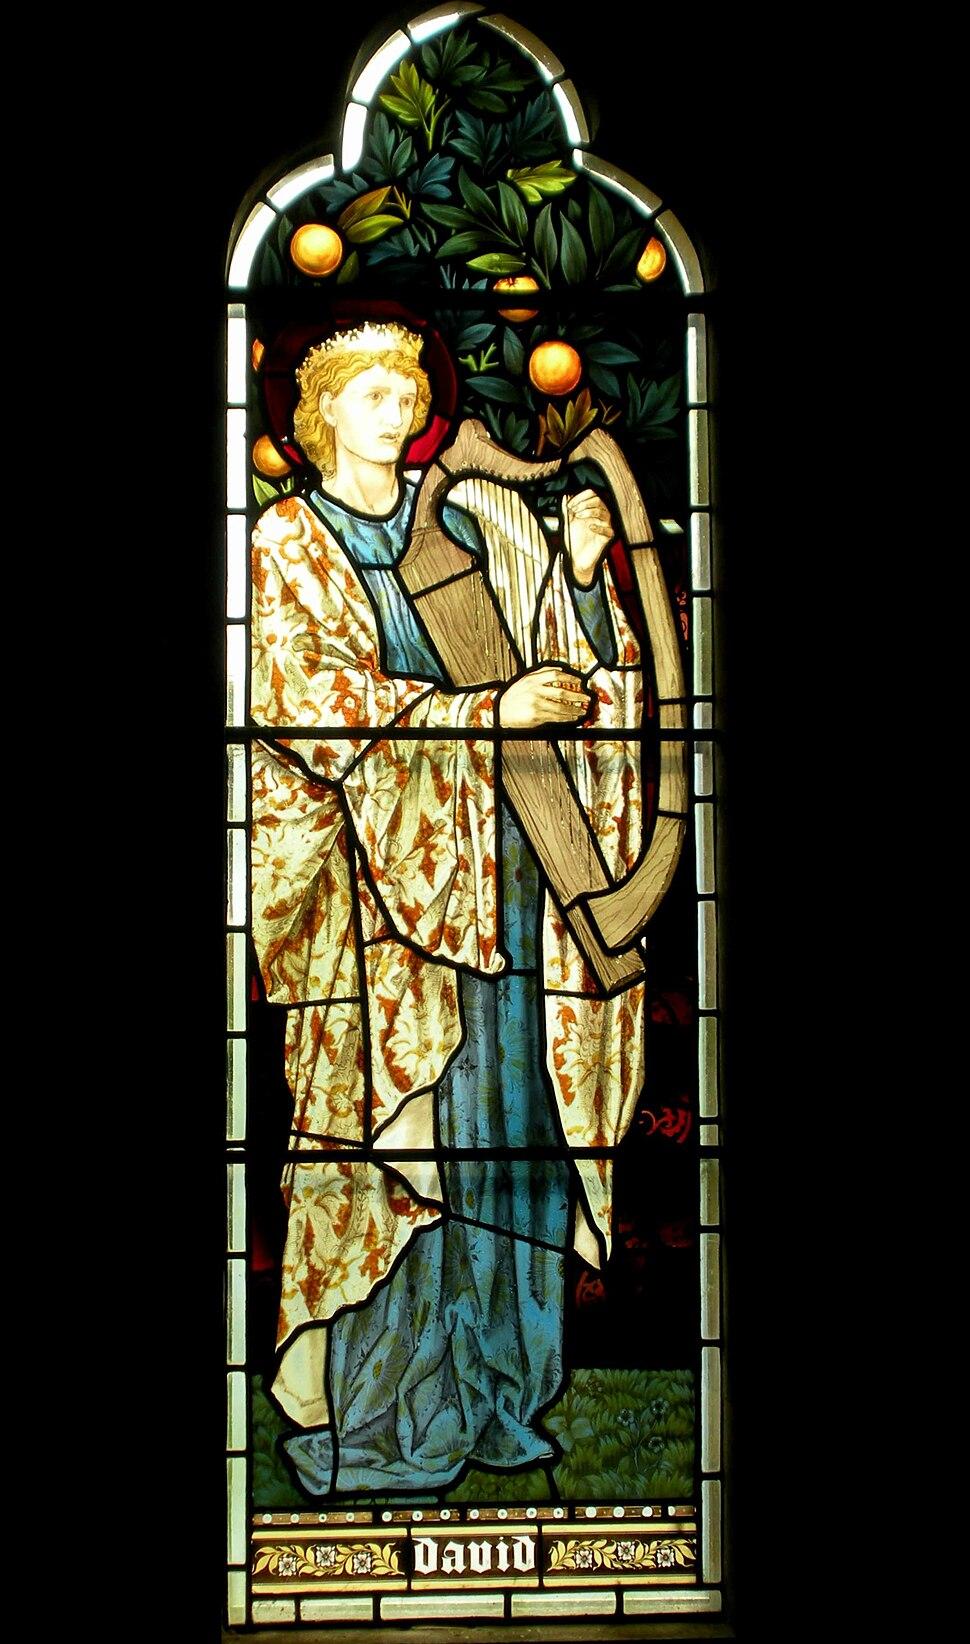 David Burne-Jones